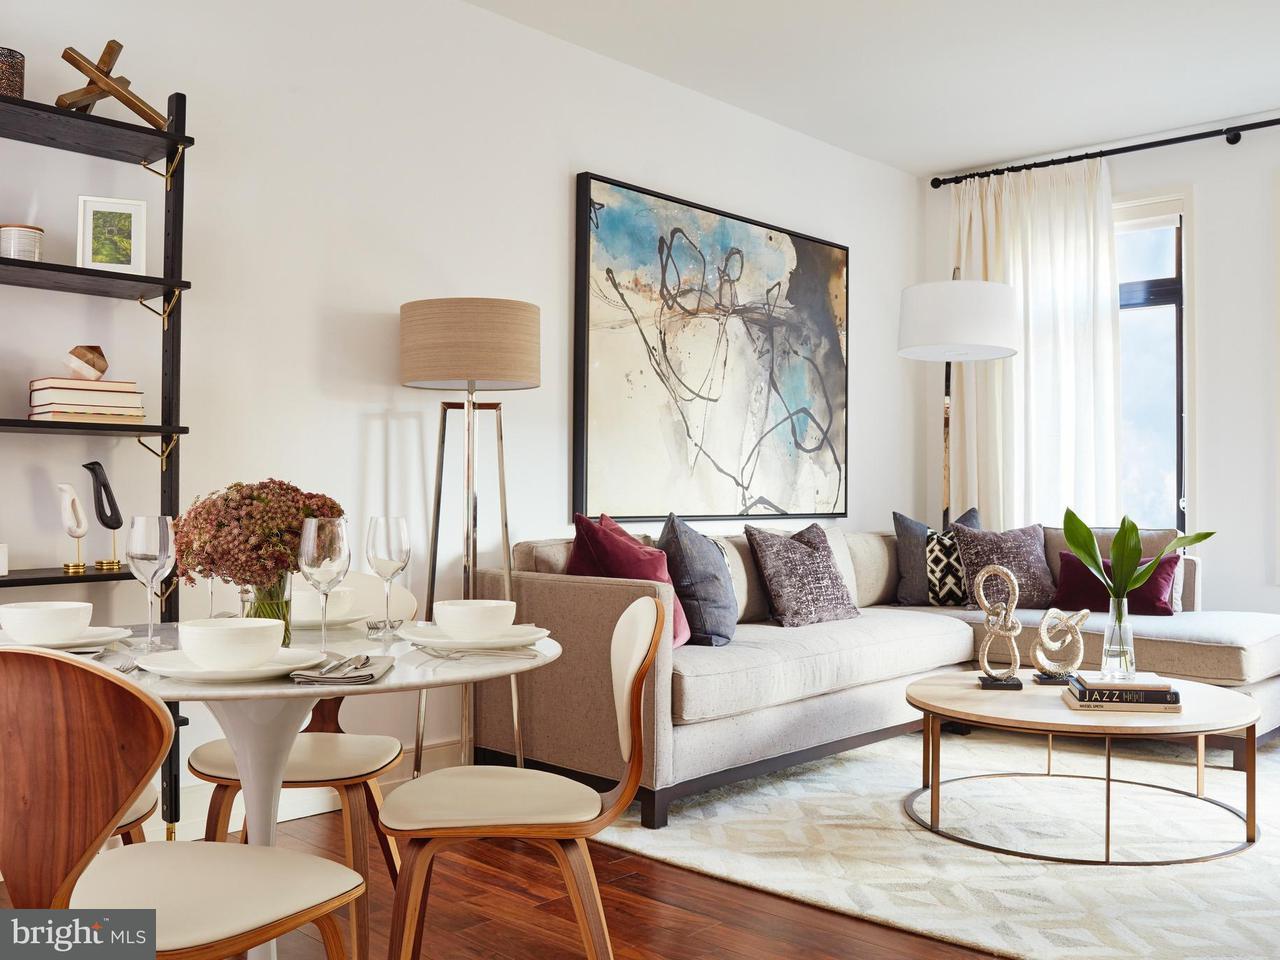 Condominium for Rent at 1310 U St NW #713 Washington, District Of Columbia 20009 United States